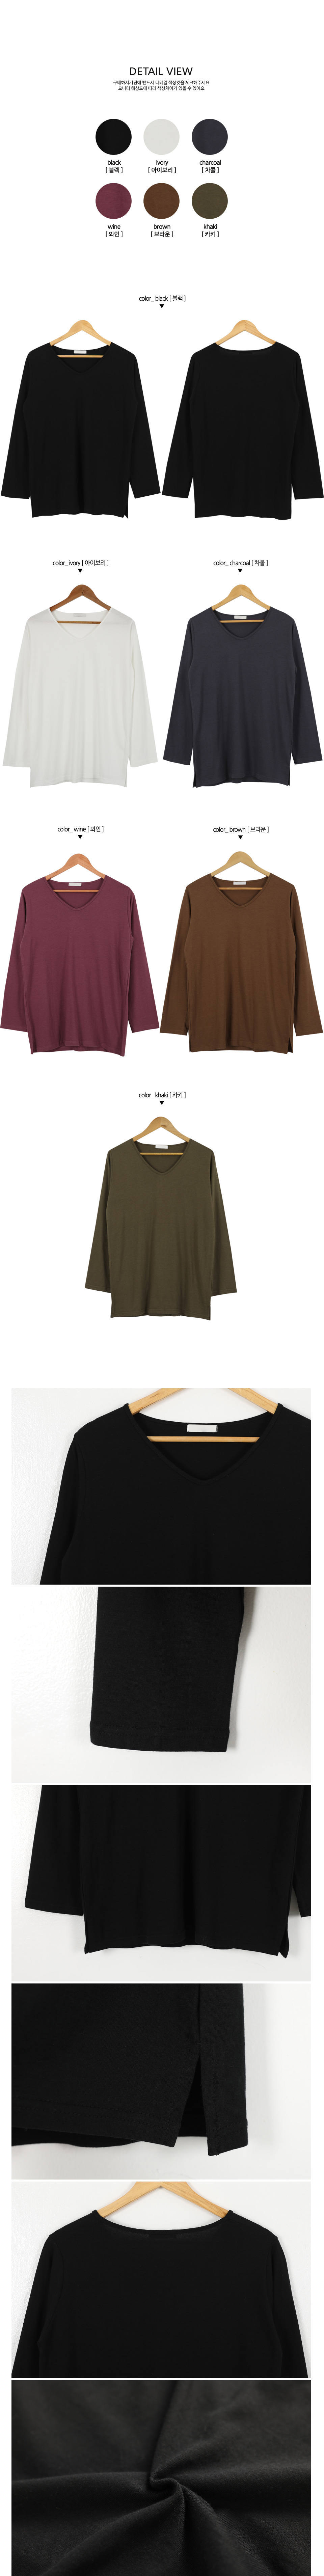 Late V T-shirt